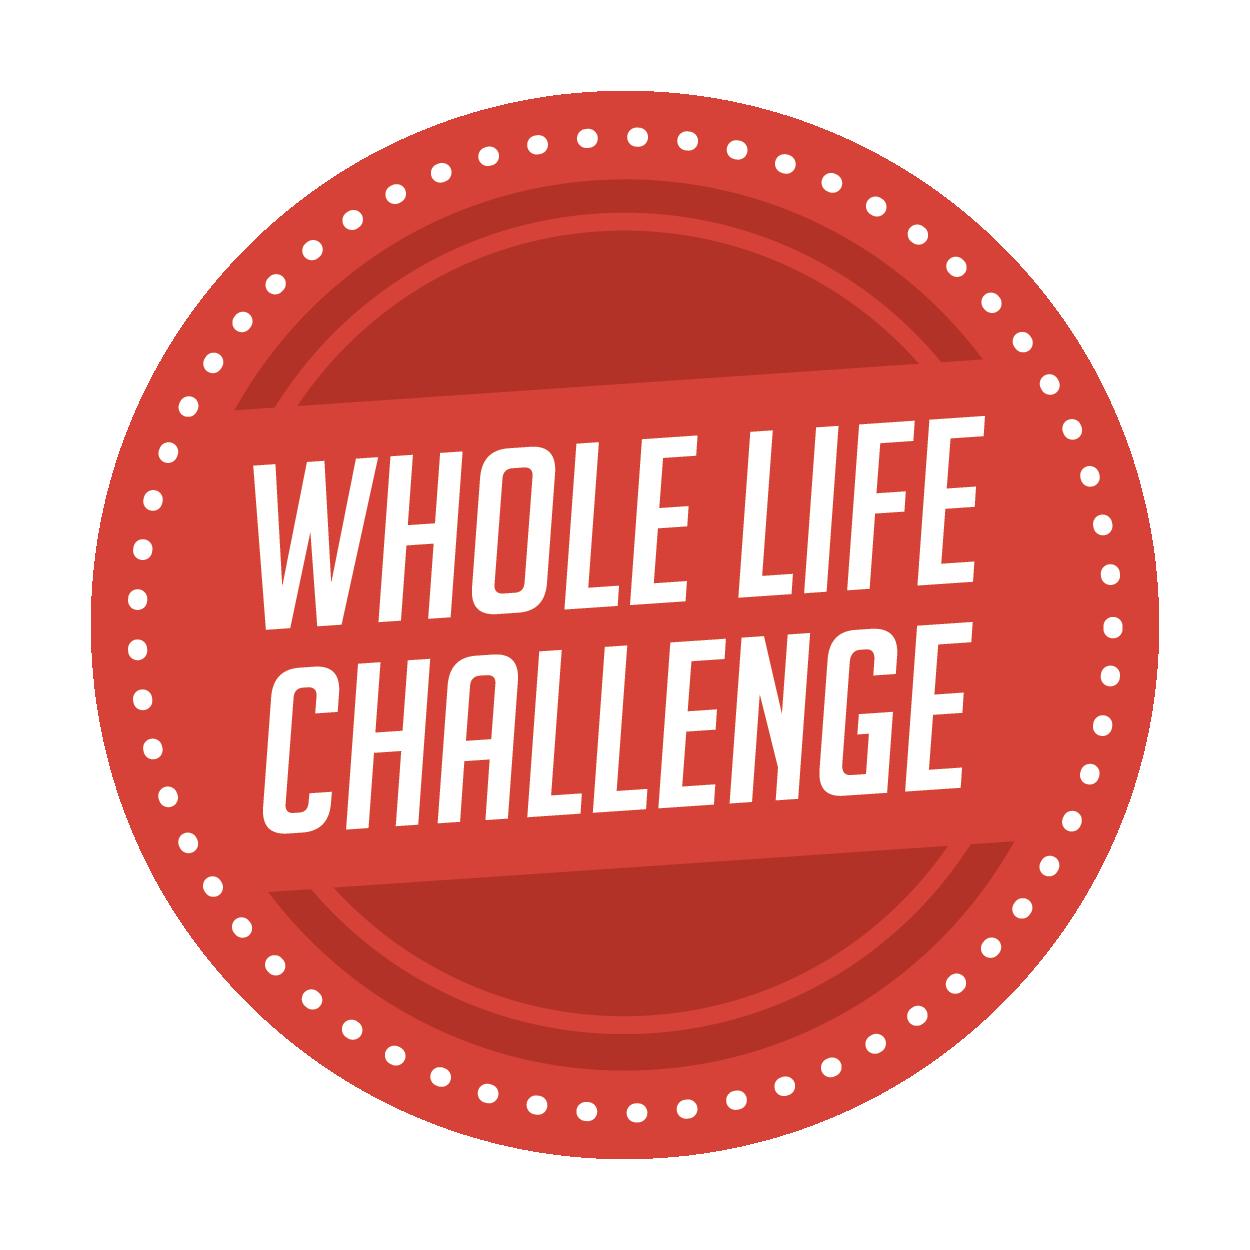 Whole life challenge red logo 0ad8dbca3388d307277a362037a0feda4e5f83ad7c40b9cbb4cb3b6bbcd8d052